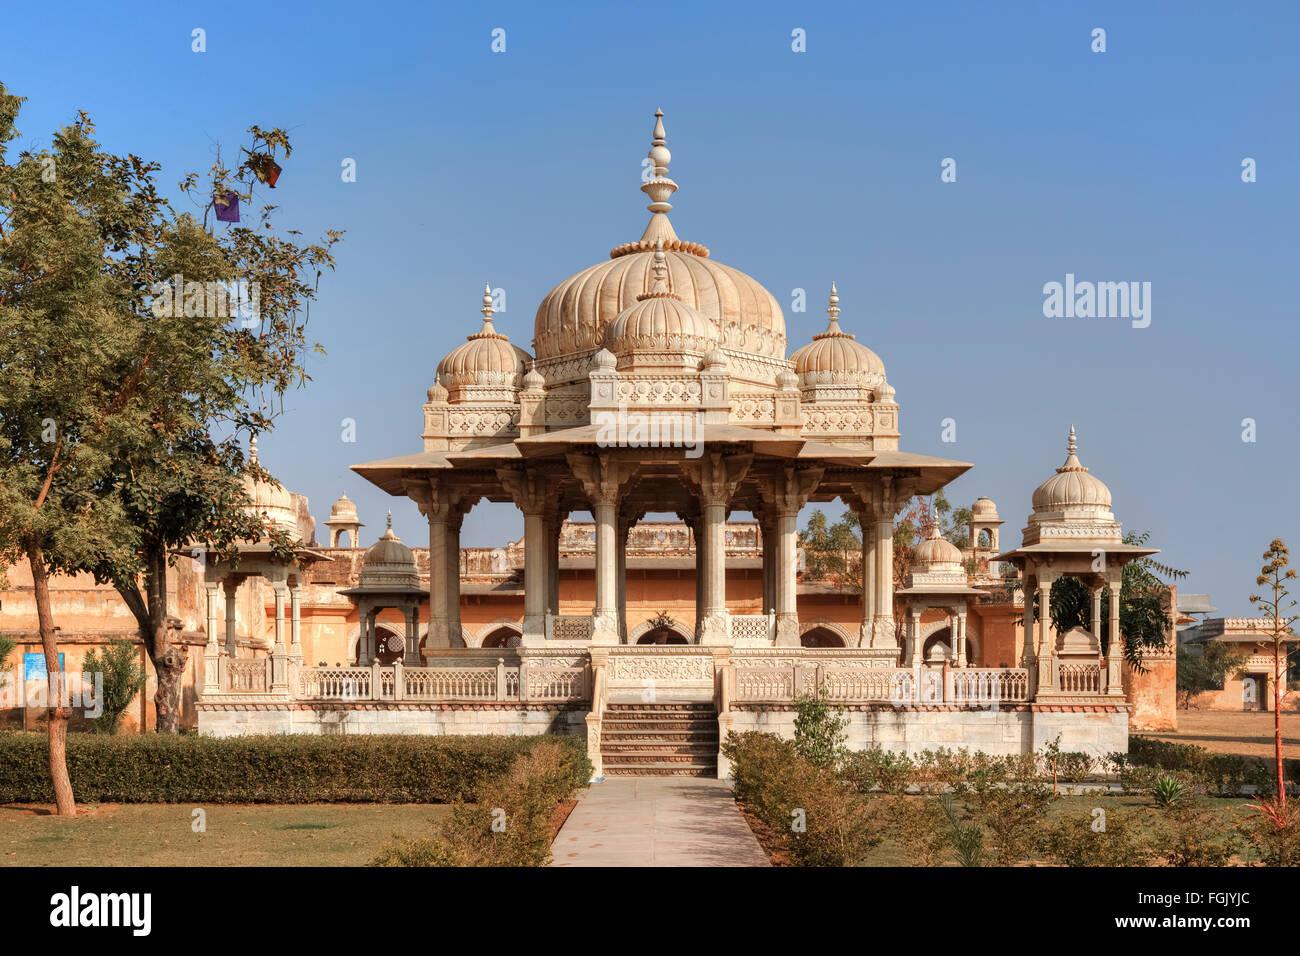 Gatore, Jaipur; Rajasthan; India Immagini Stock